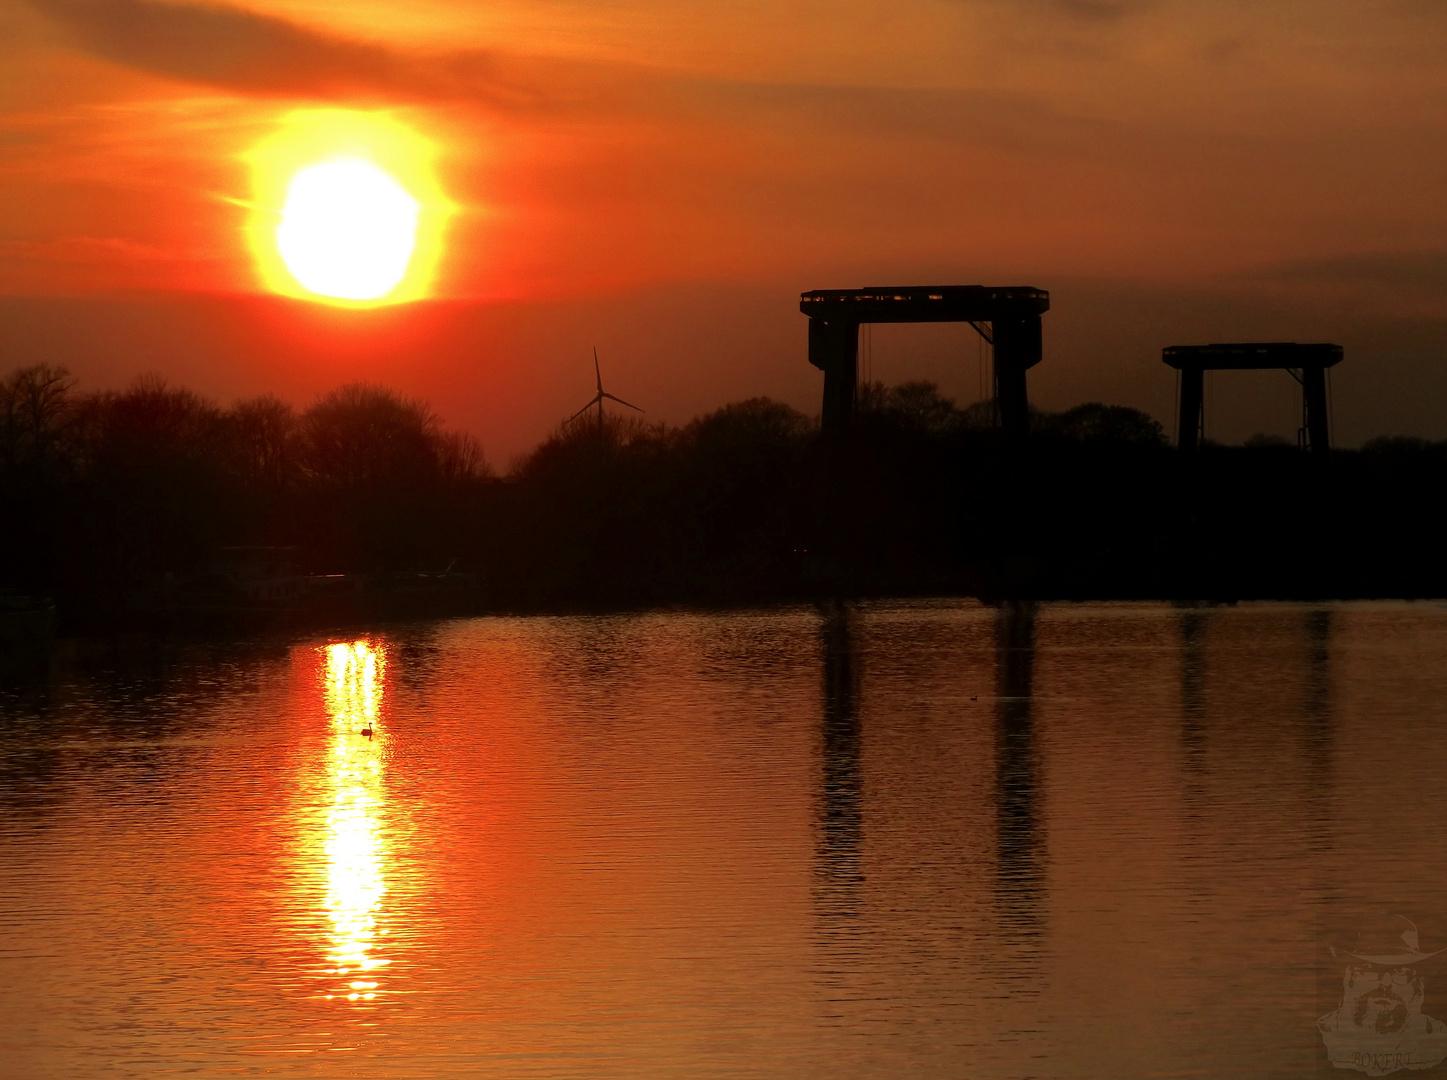 Sonnenuntergang an der Schleuse Emmelsum